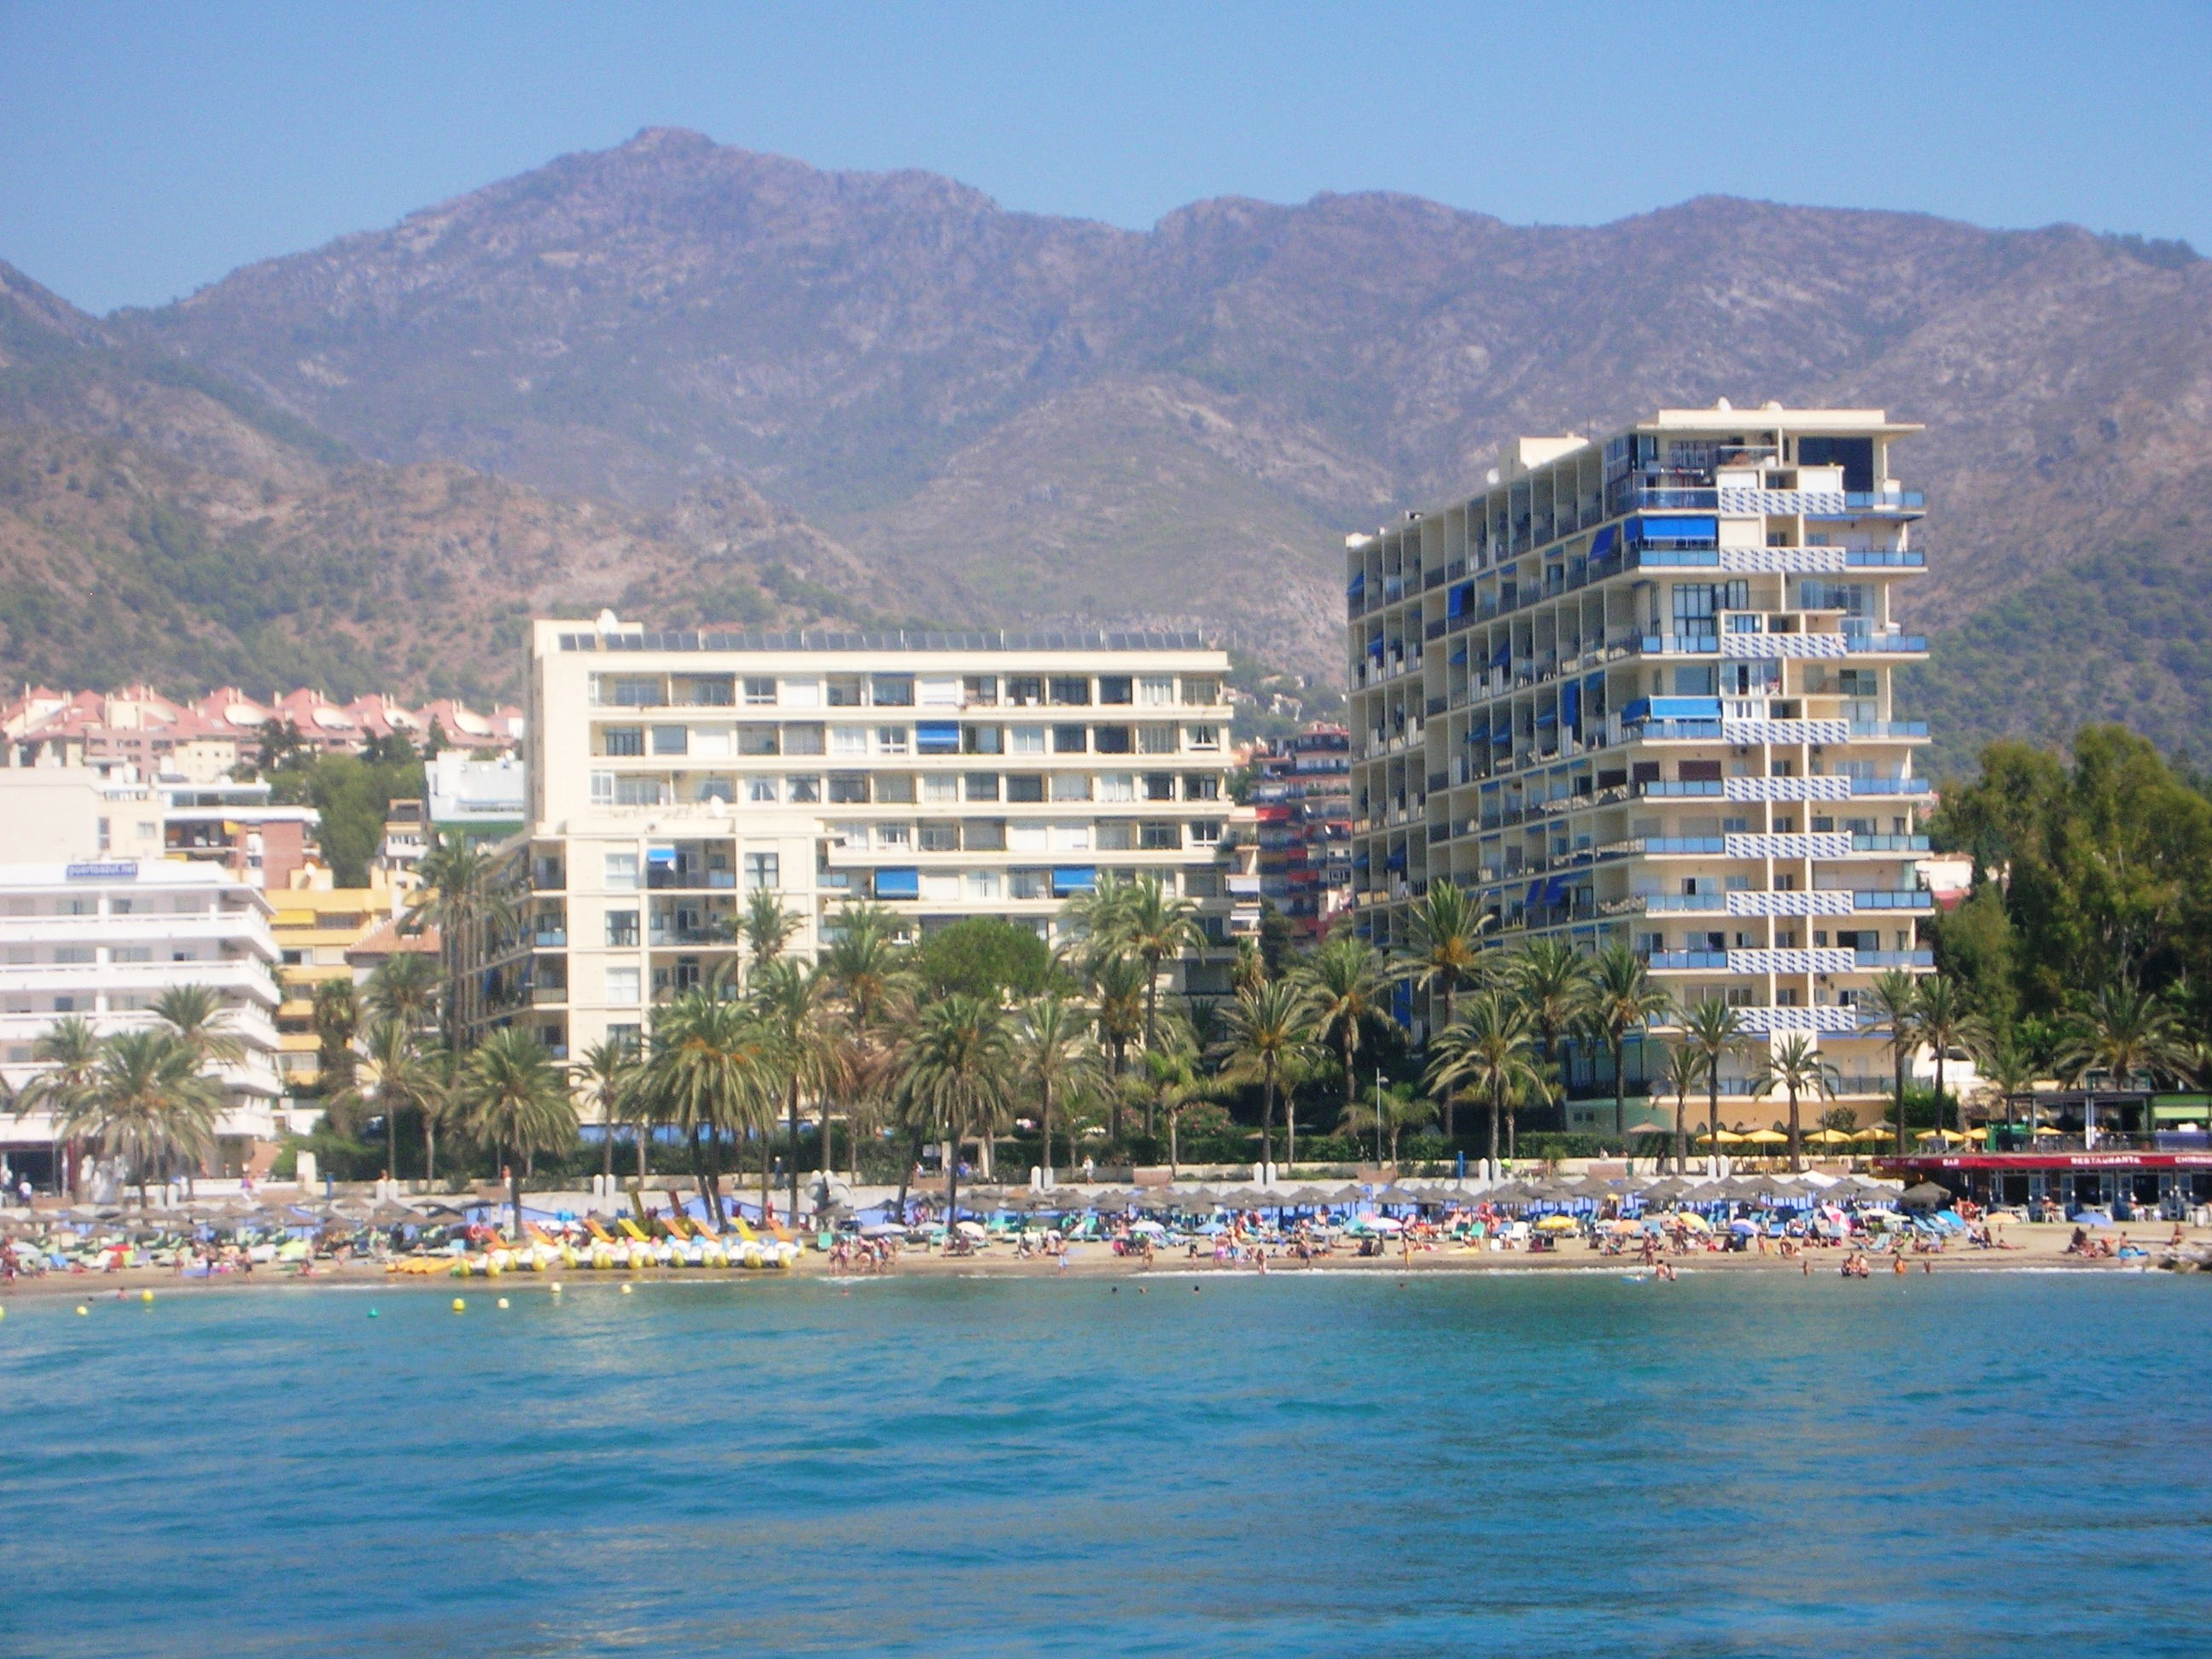 Skol apartments, Marbella